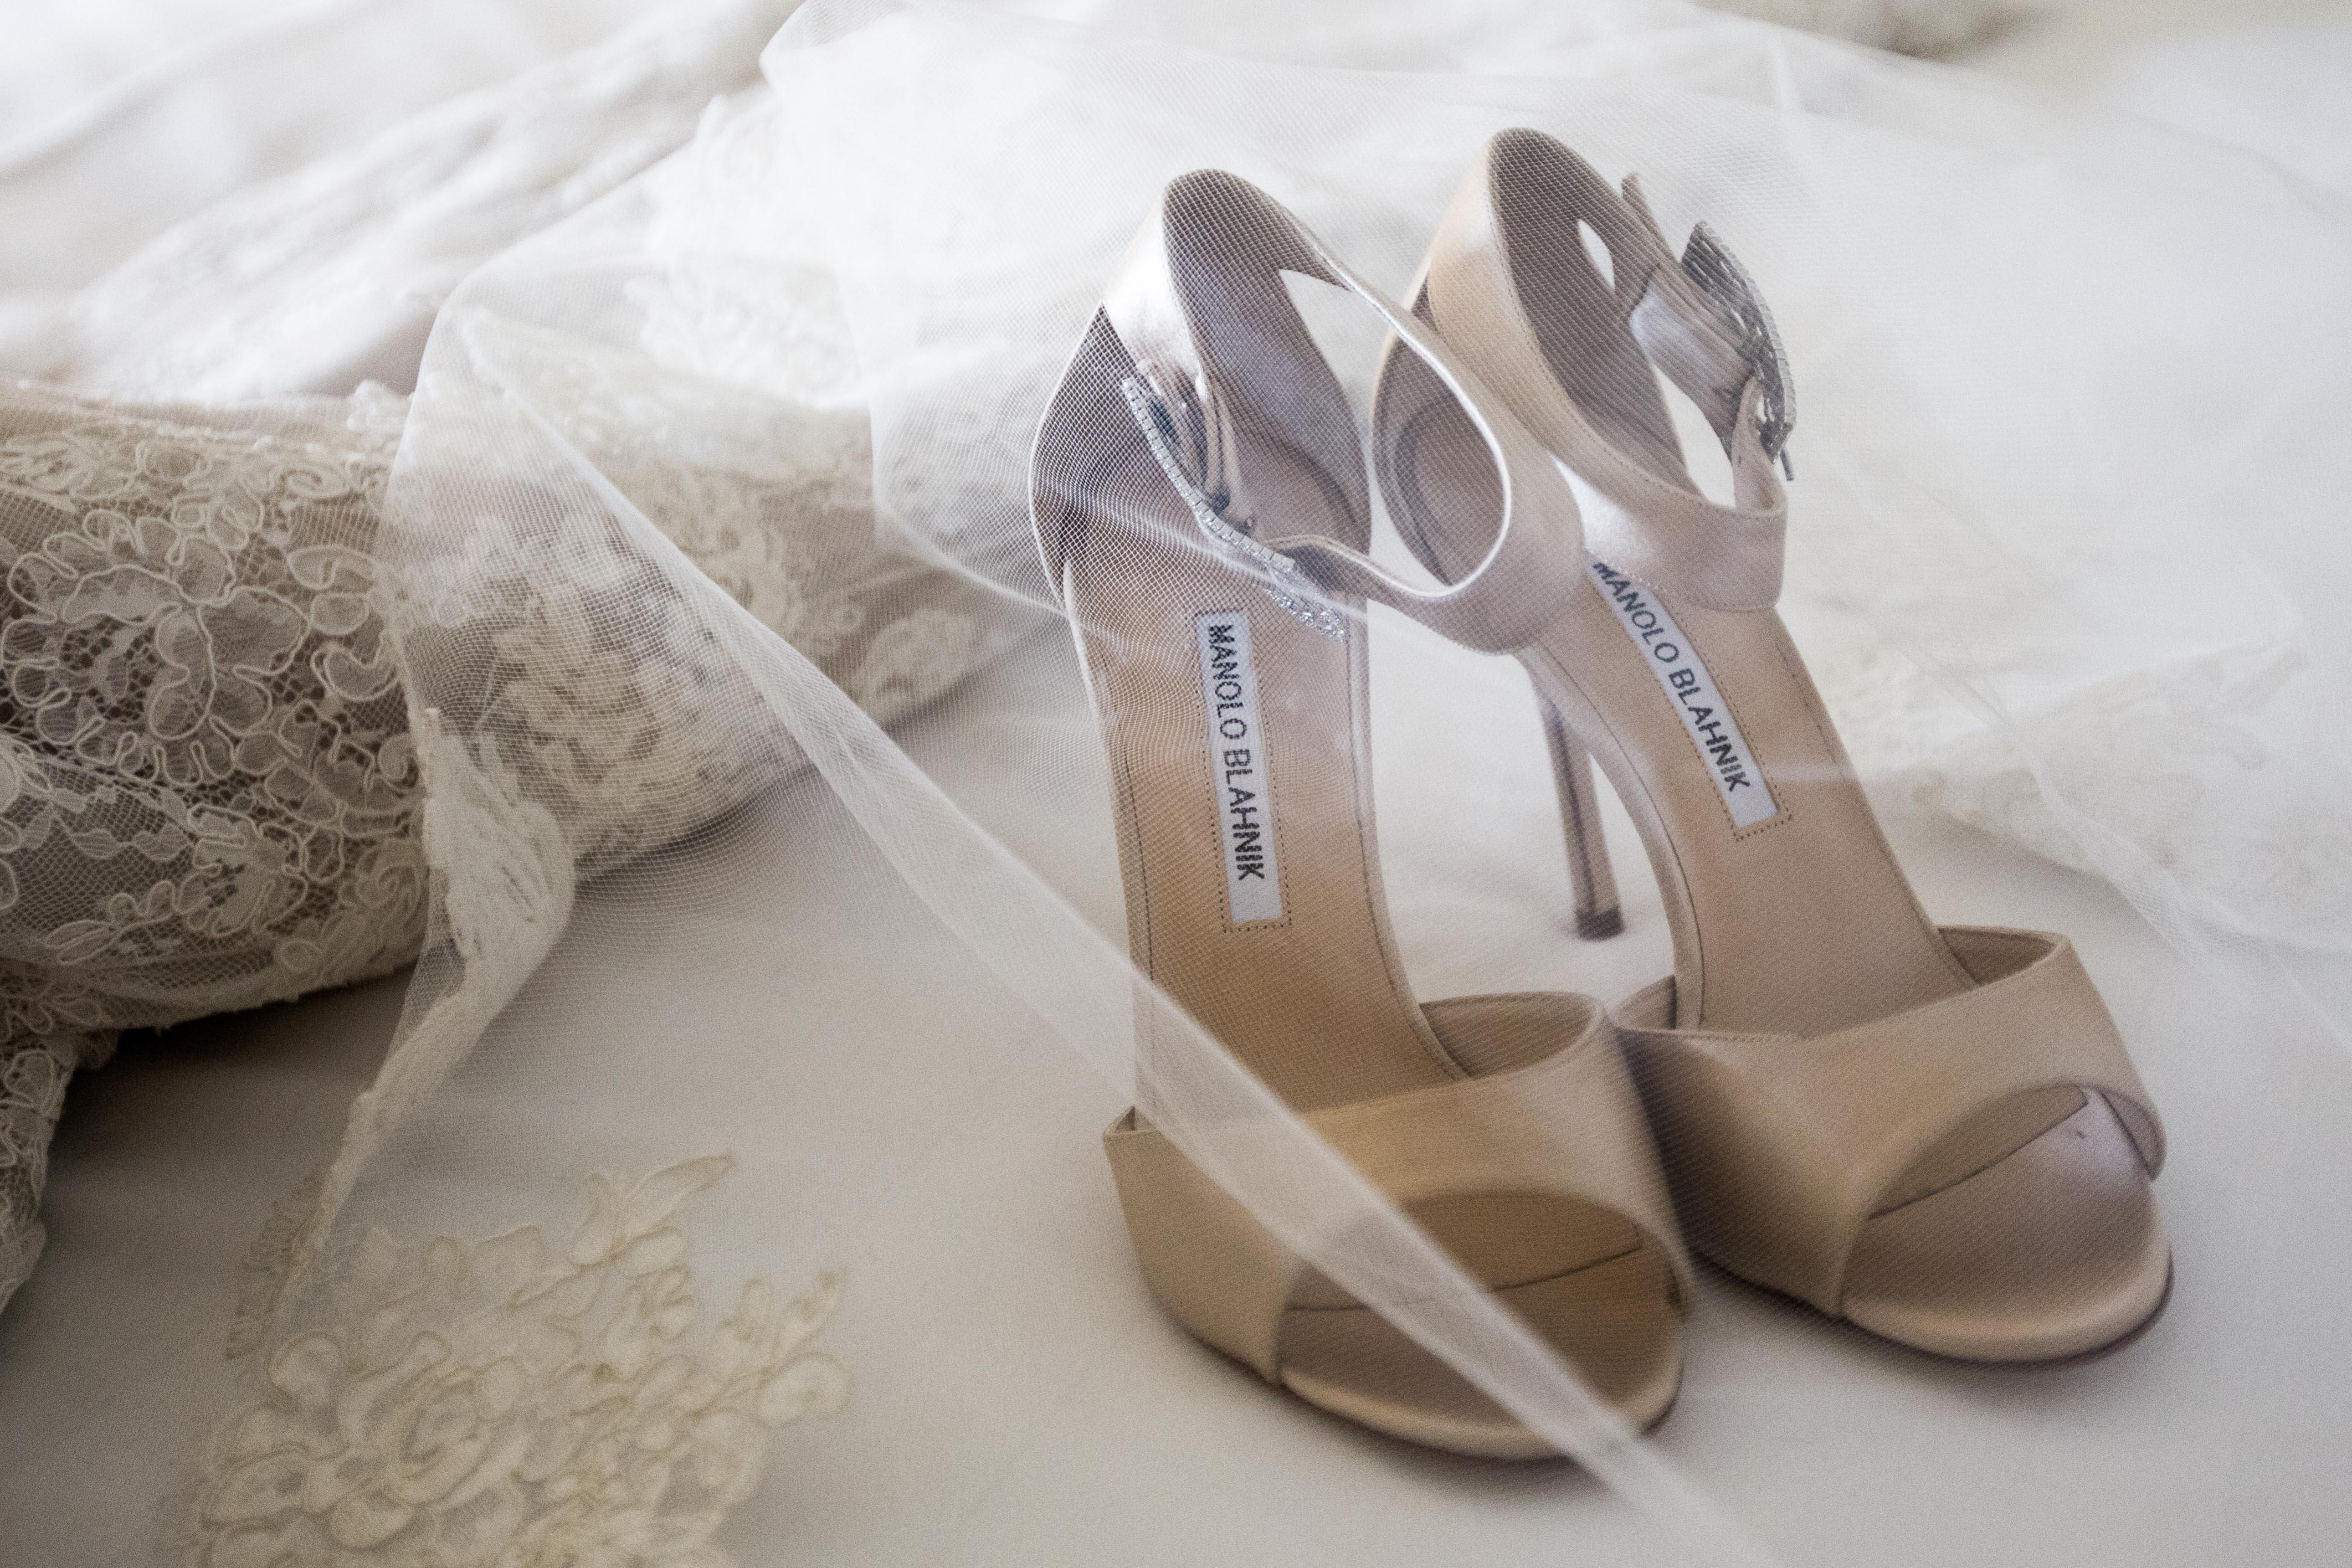 Hyattt hotel wedding greenwich ct detail shot of shoes, veil and dress